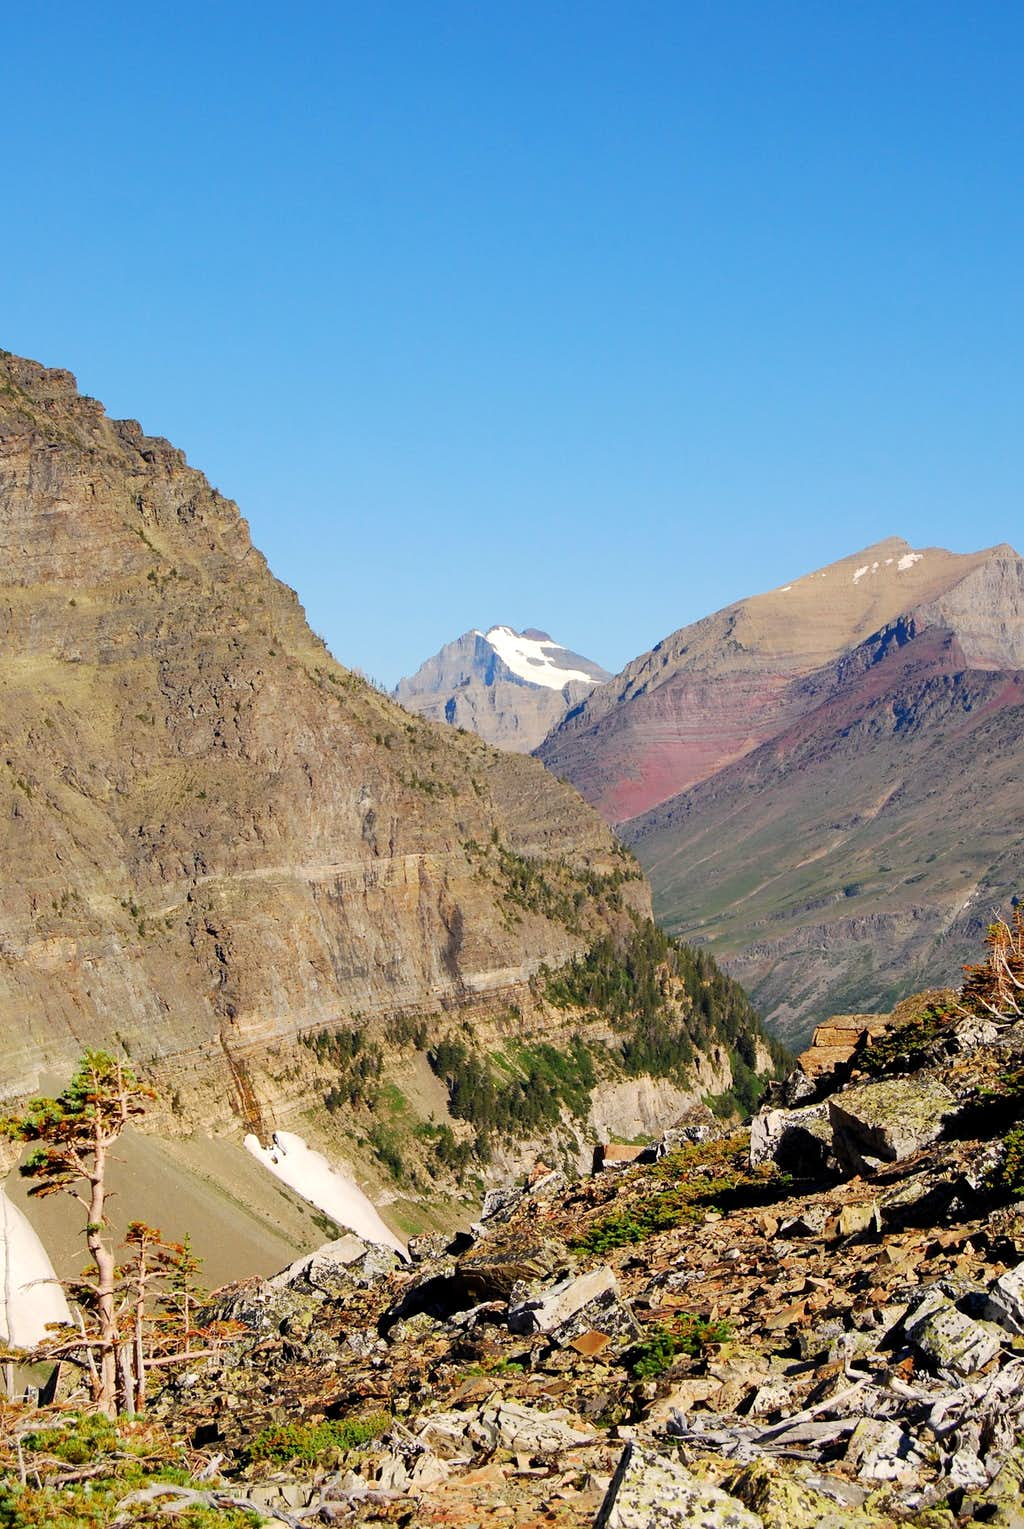 Mount Merritt with Old Sun Glacier